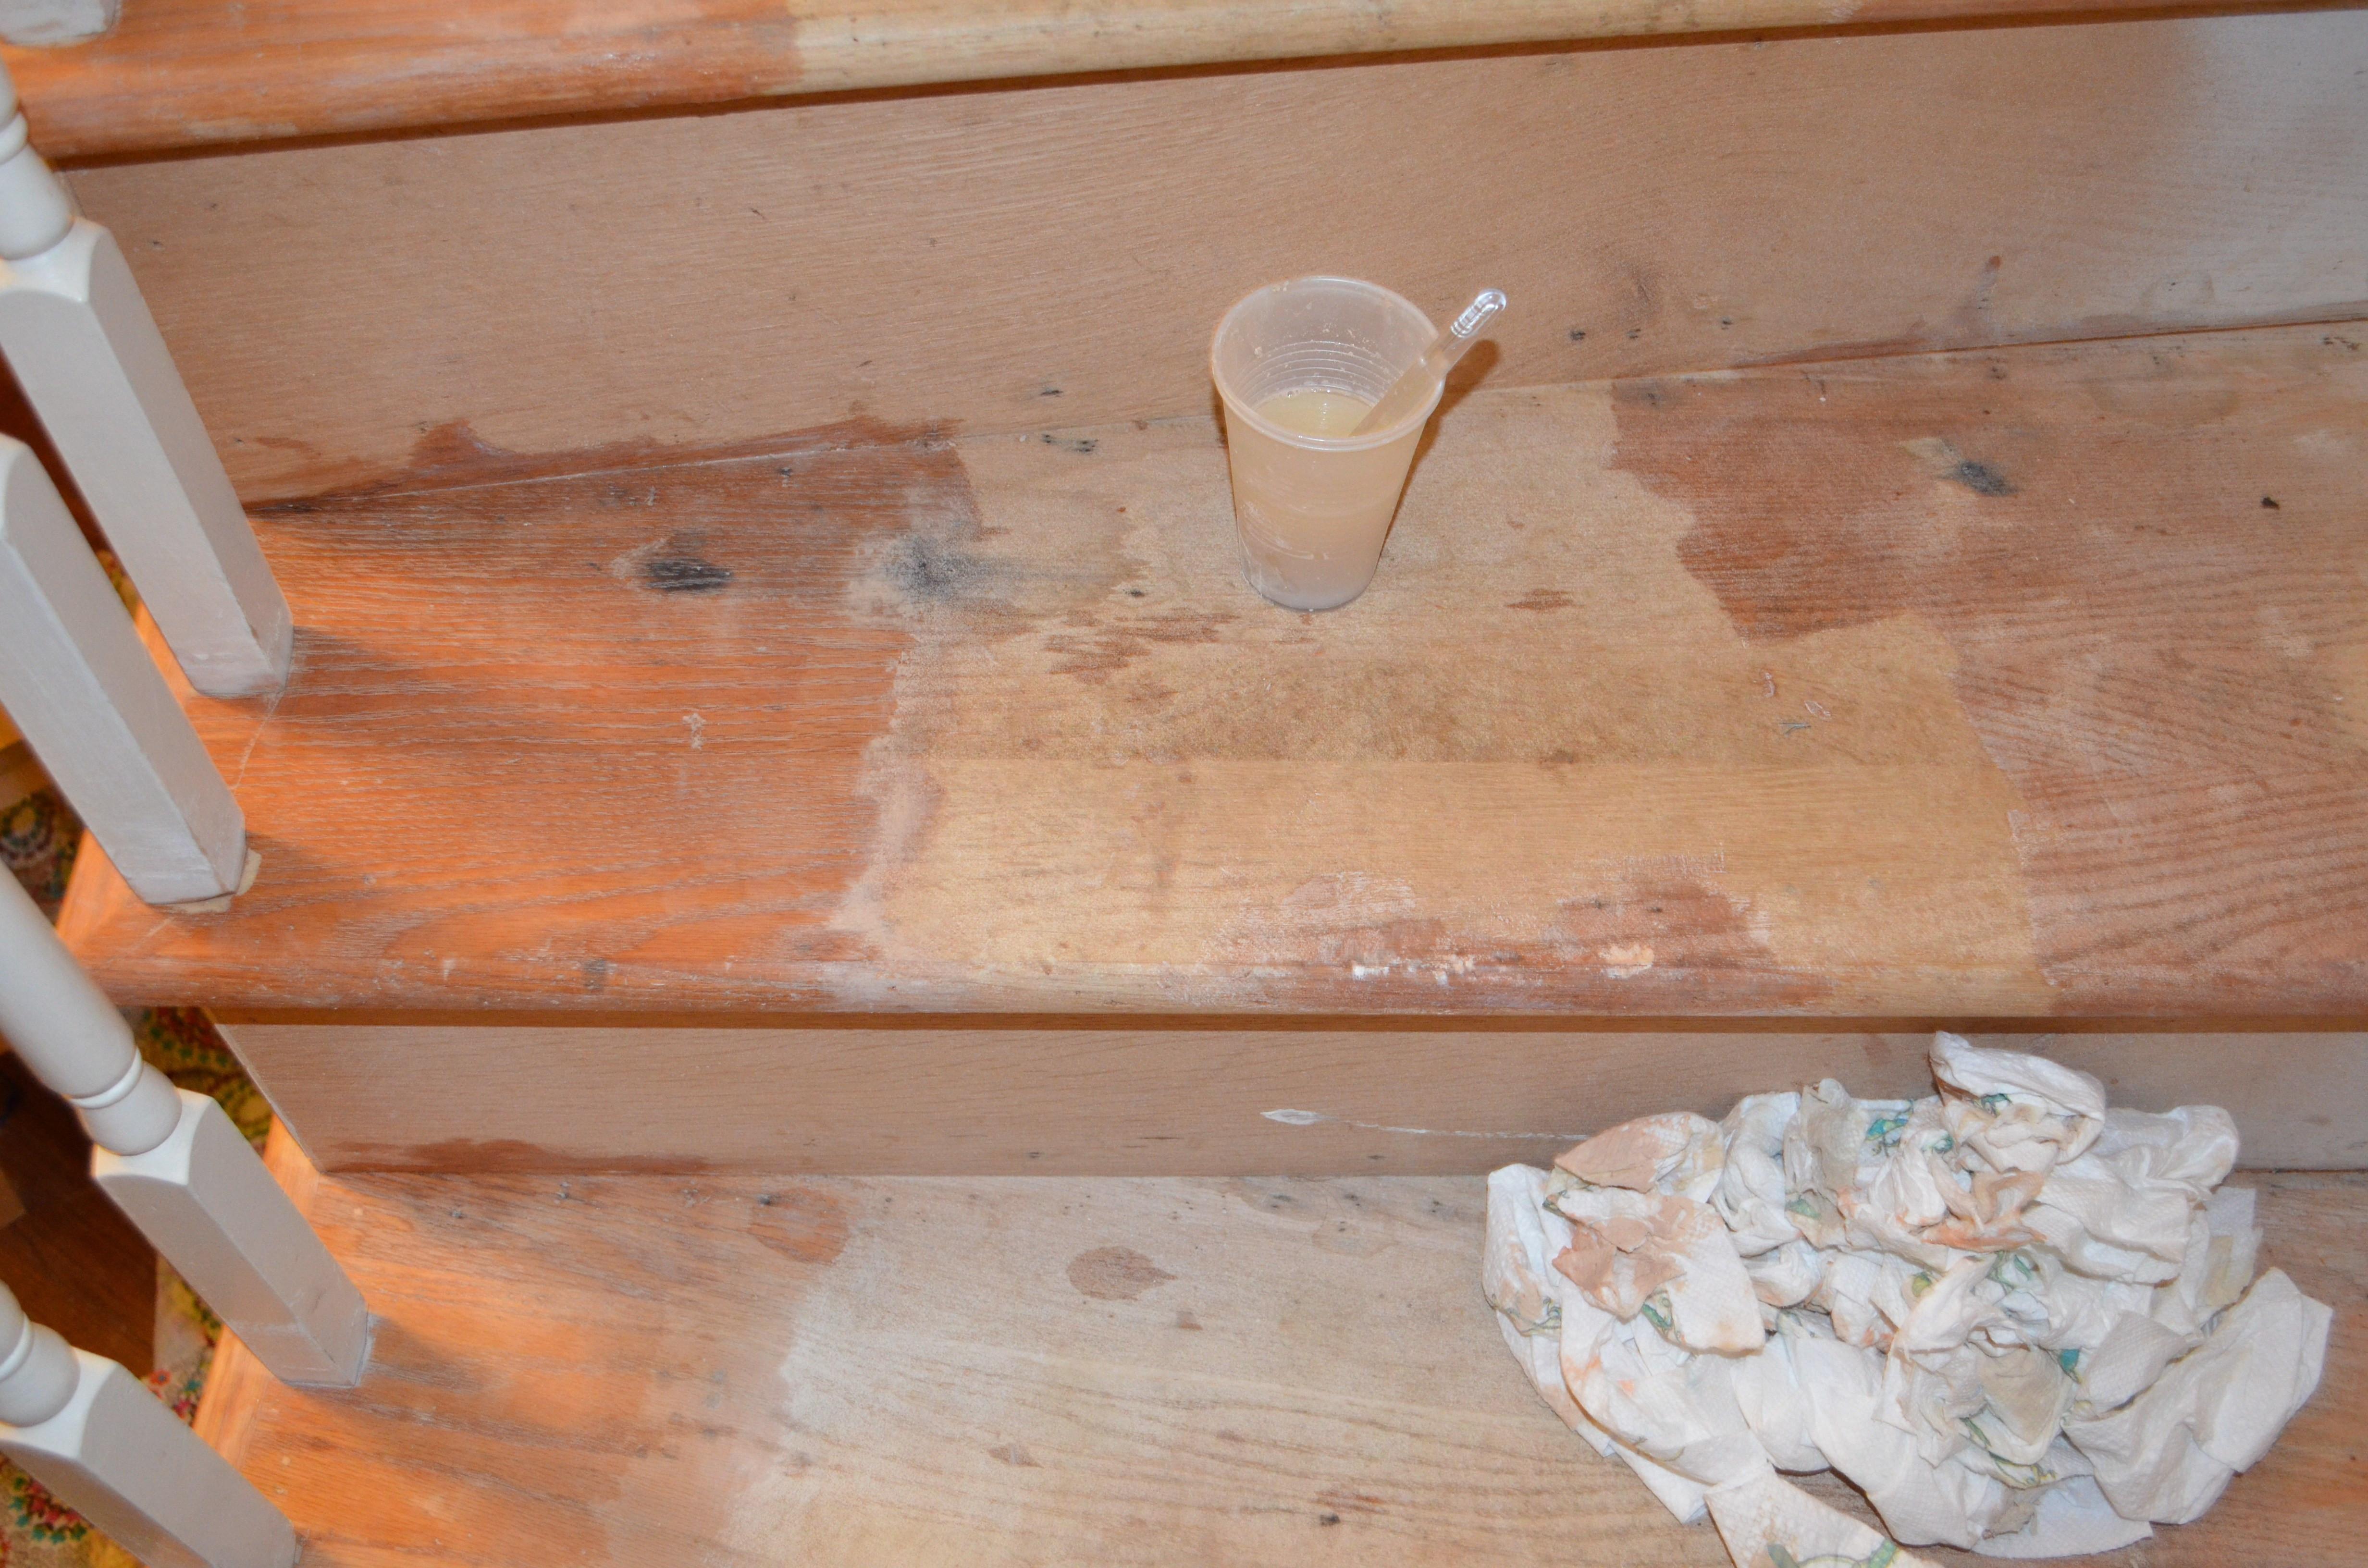 5 16 hardwood floor nailer of upstairs hallway 1 installing hardwood floors with regard to staircase 4 filling holes sanding stripping